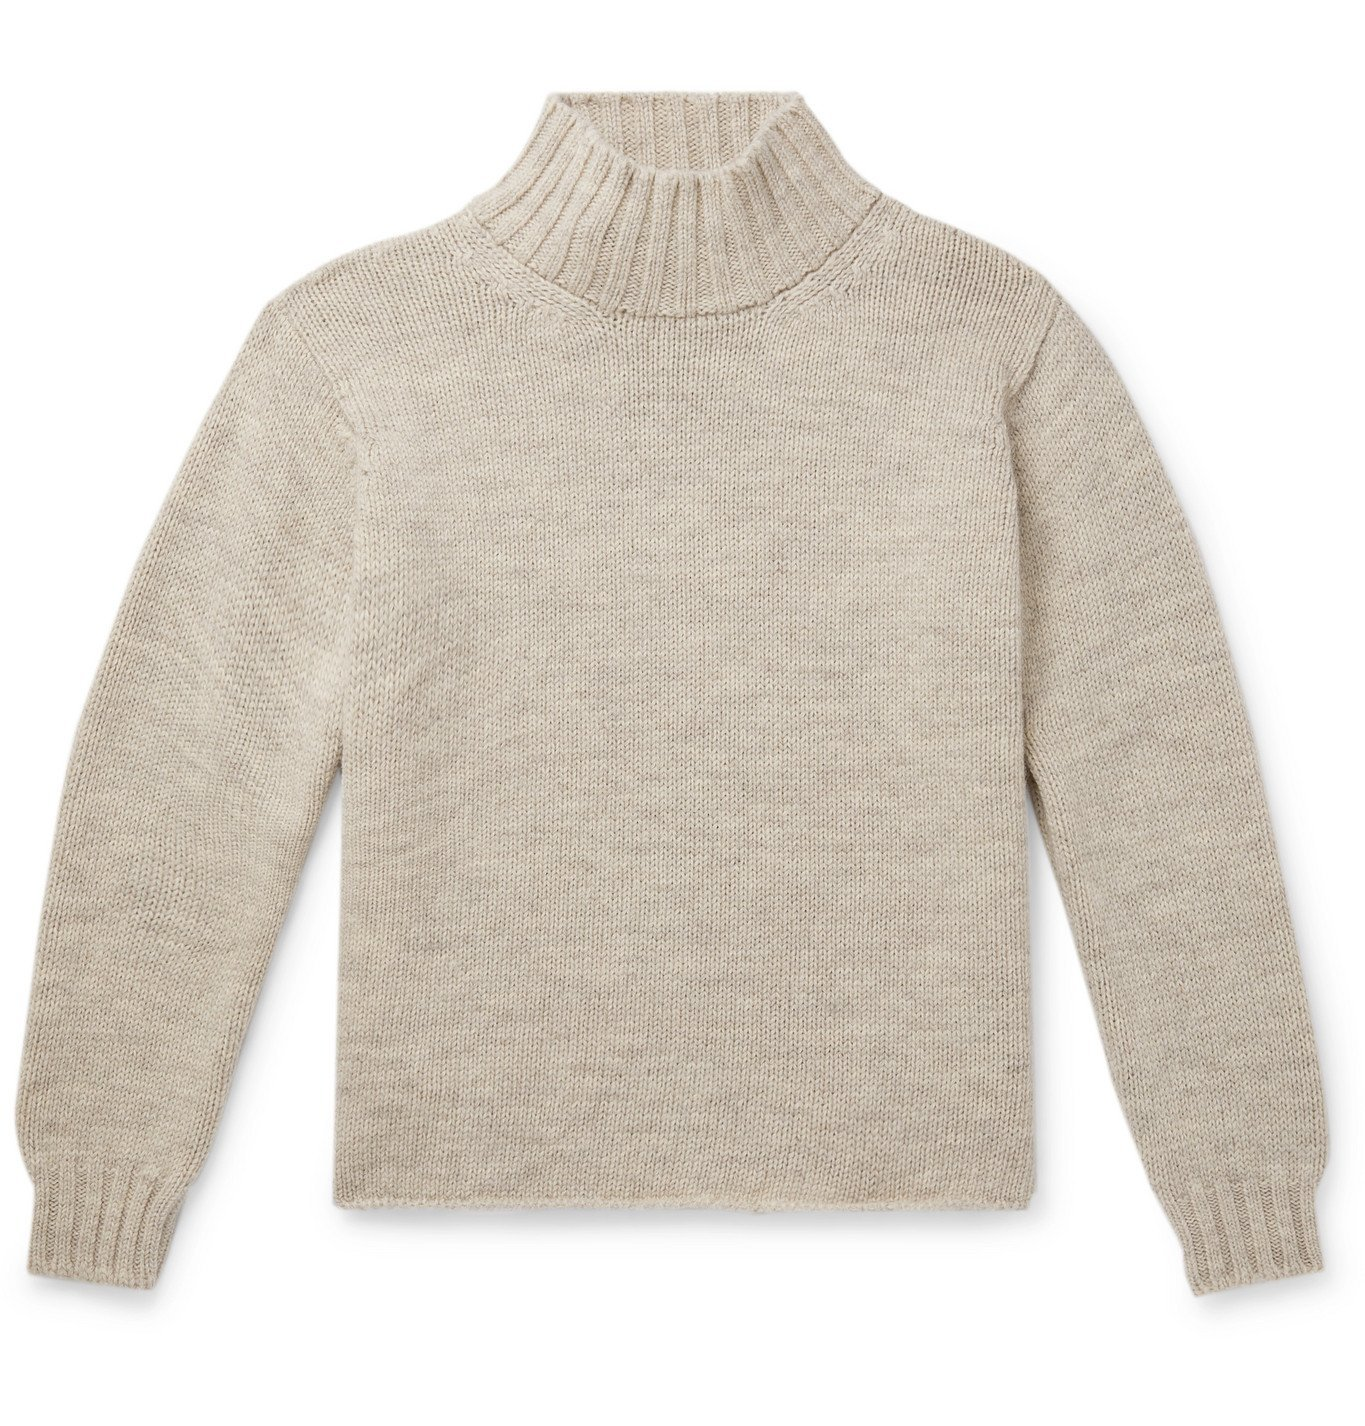 Margaret Howell - Wool Rollneck Sweater - Gray